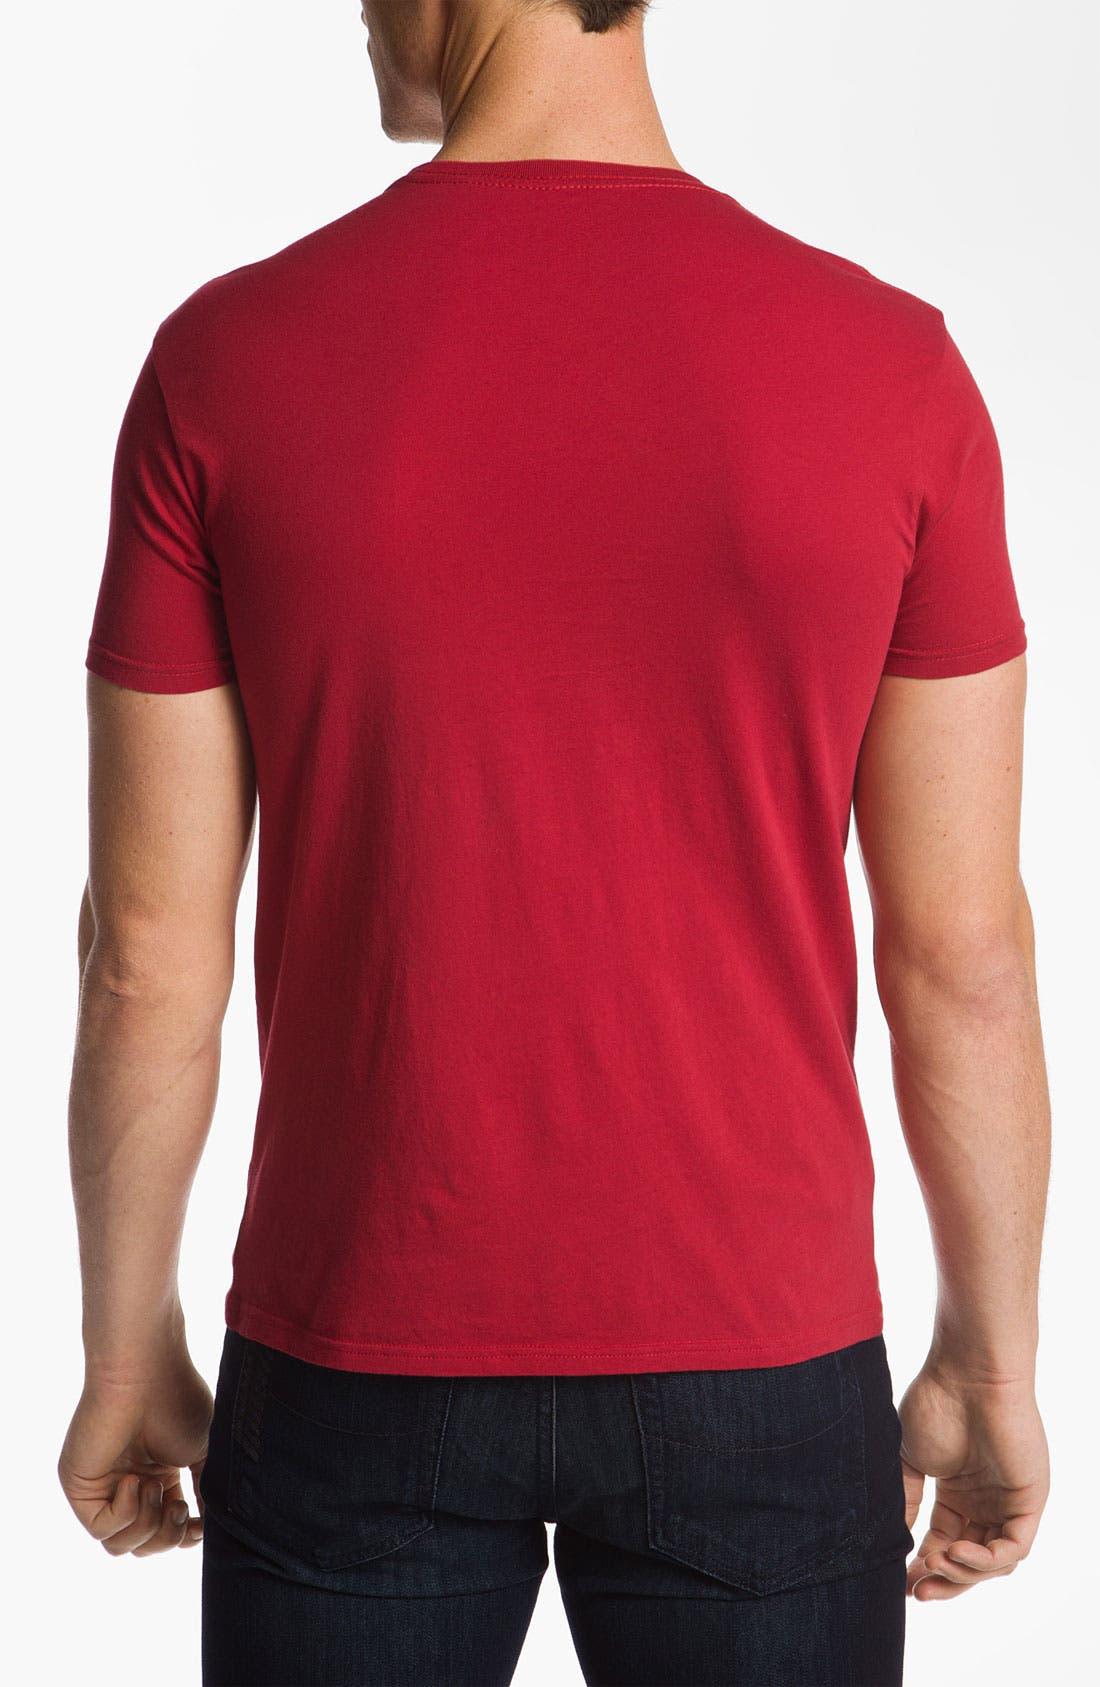 Alternate Image 2  - The Original Retro Brand 'Georgia Bulldogs' T-Shirt